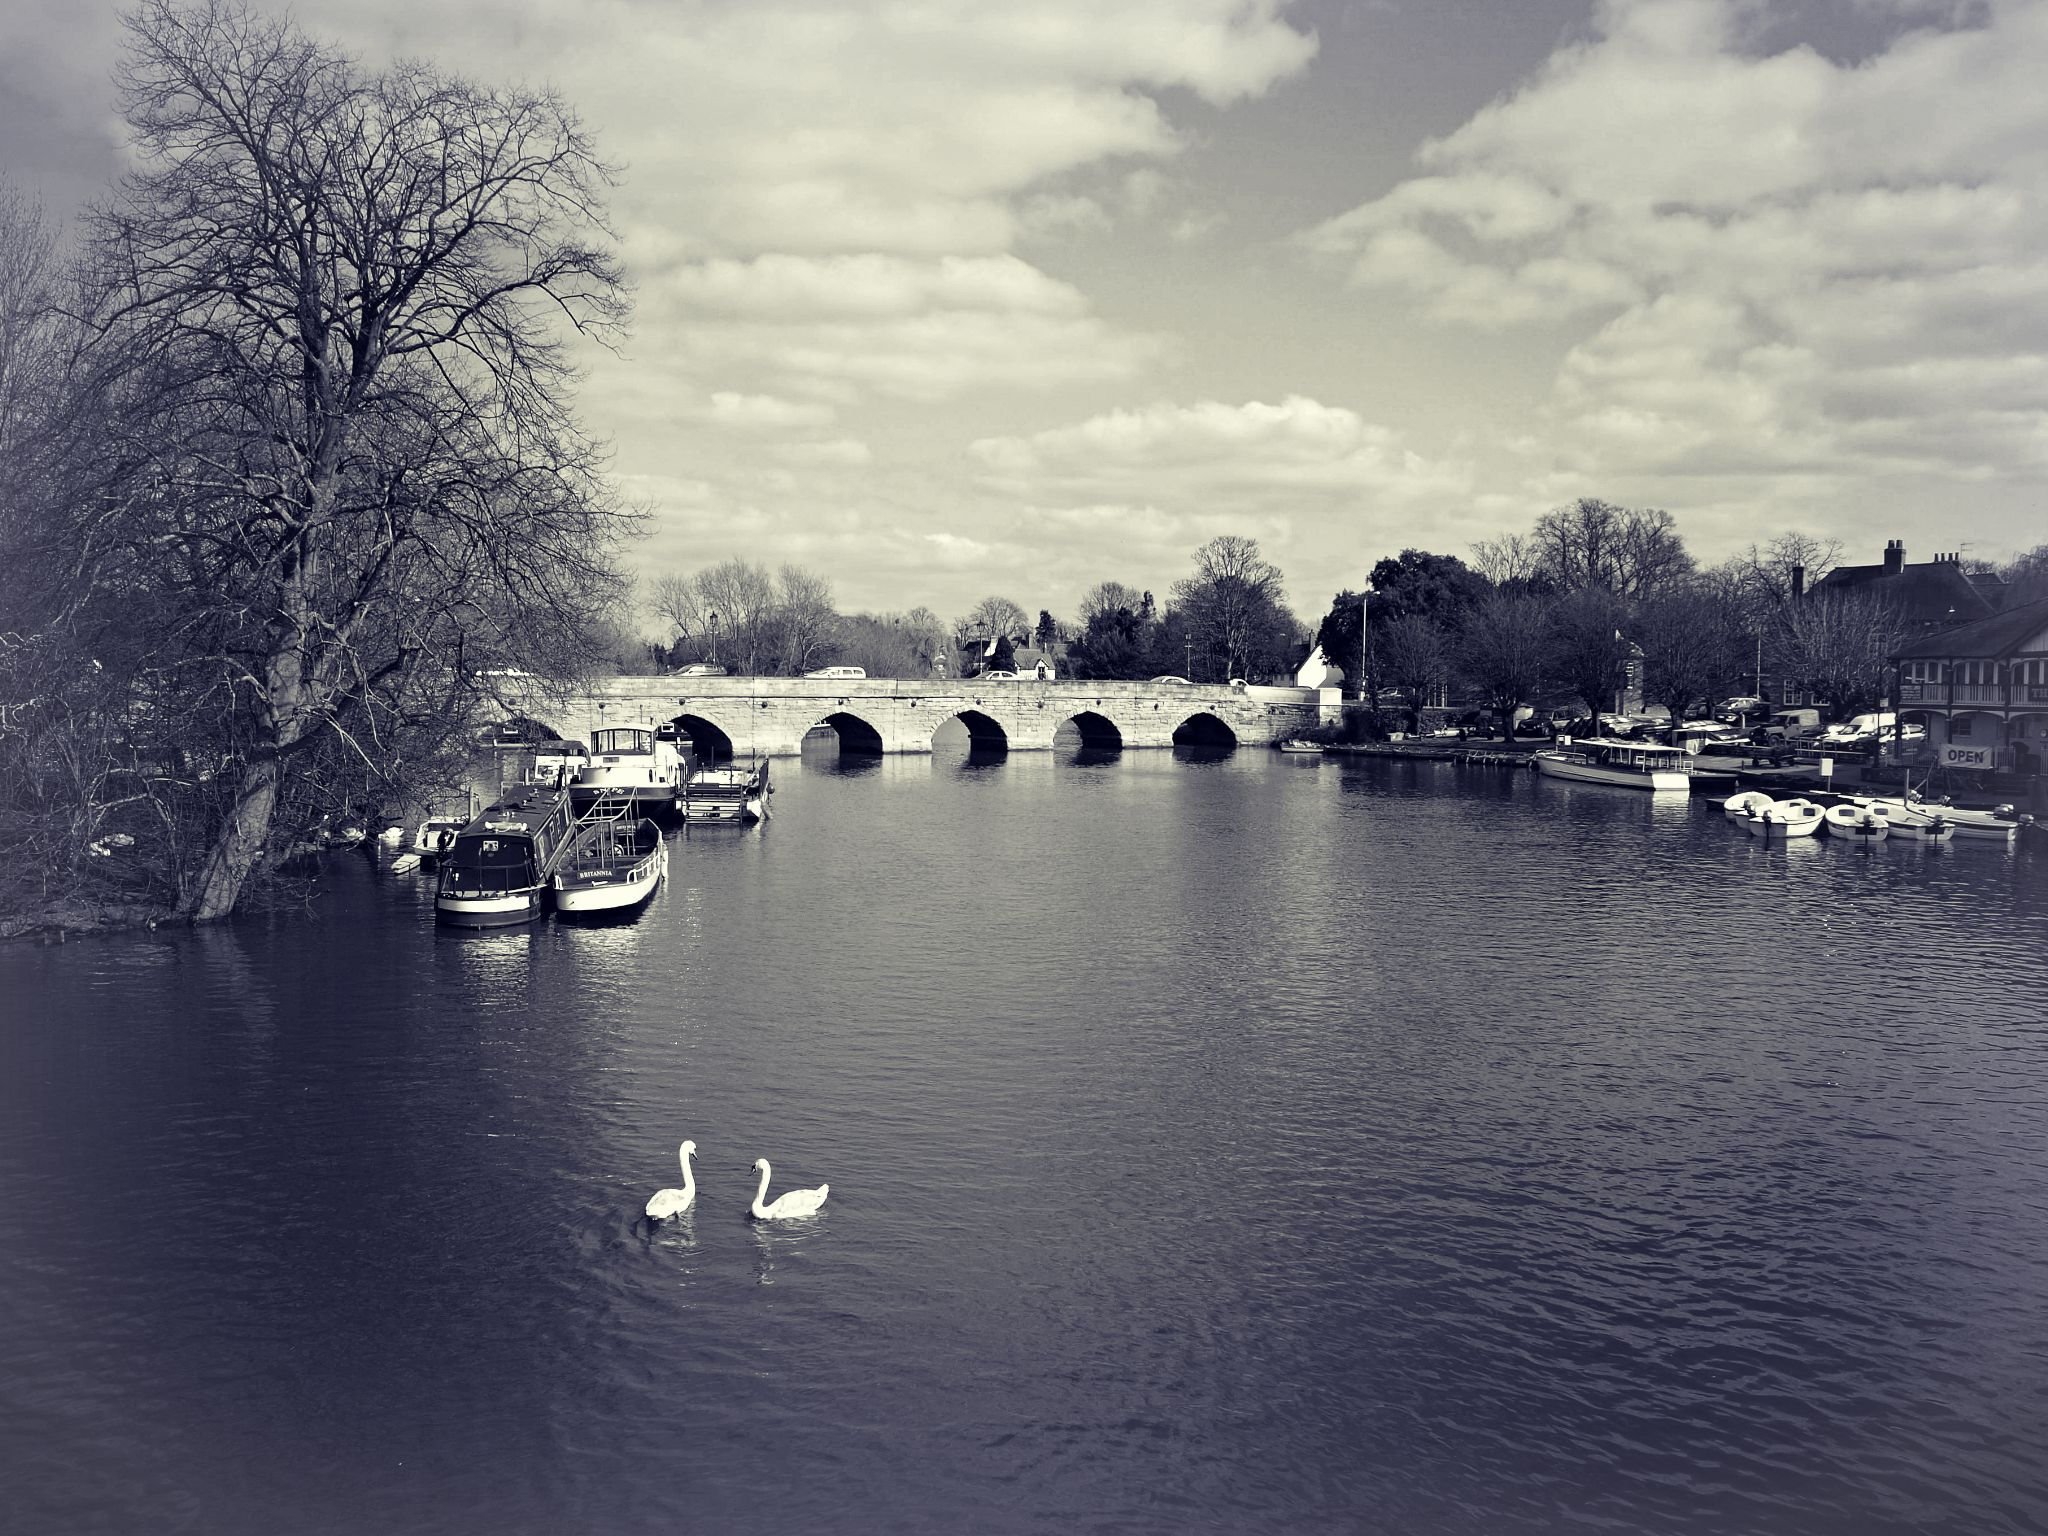 The bridge by Tim Durrant